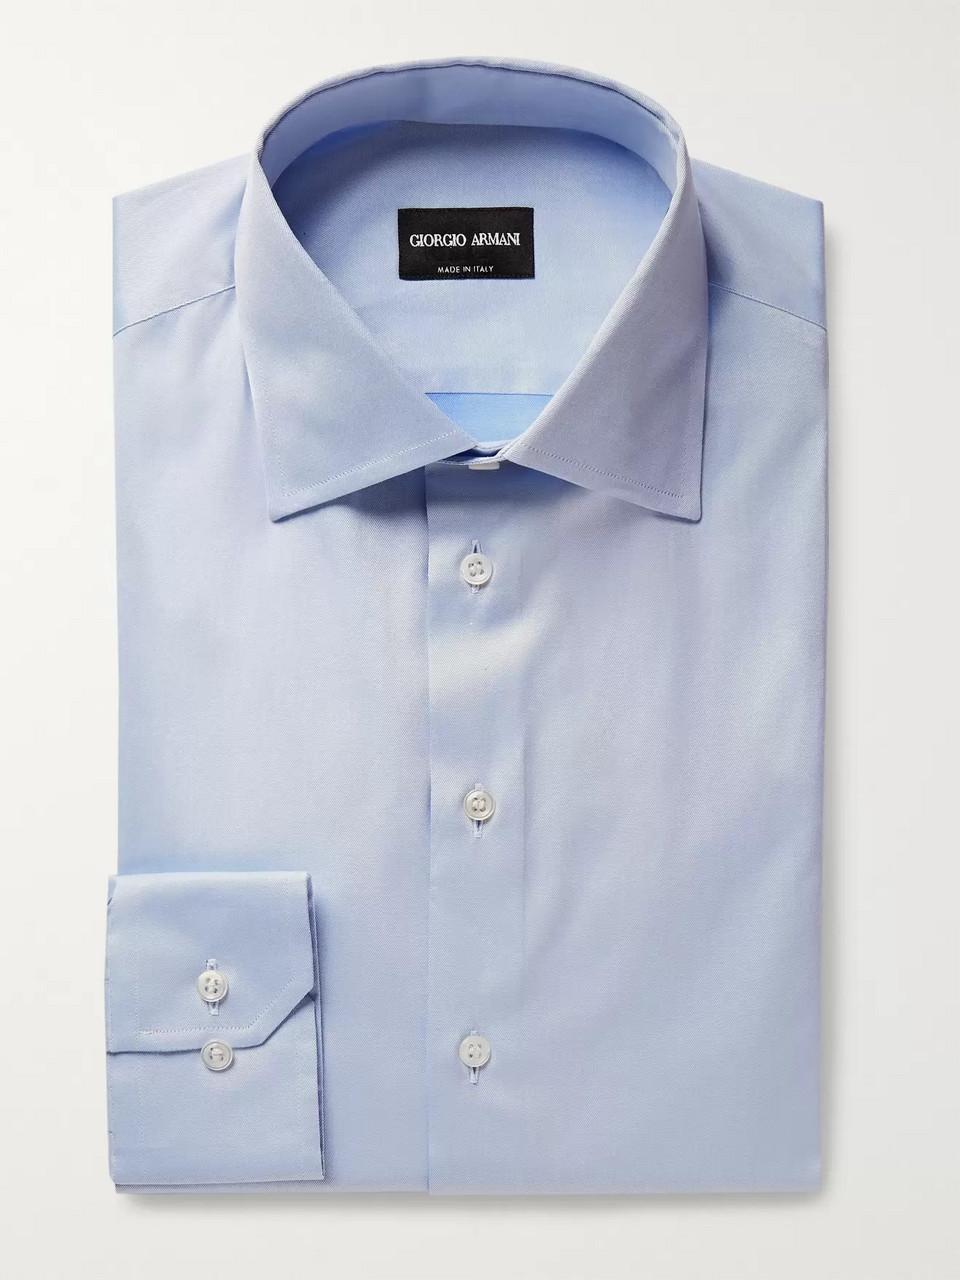 989c3819 Light blue Slim-Fit White Cotton-Poplin Shirt | Giorgio Armani | MR ...